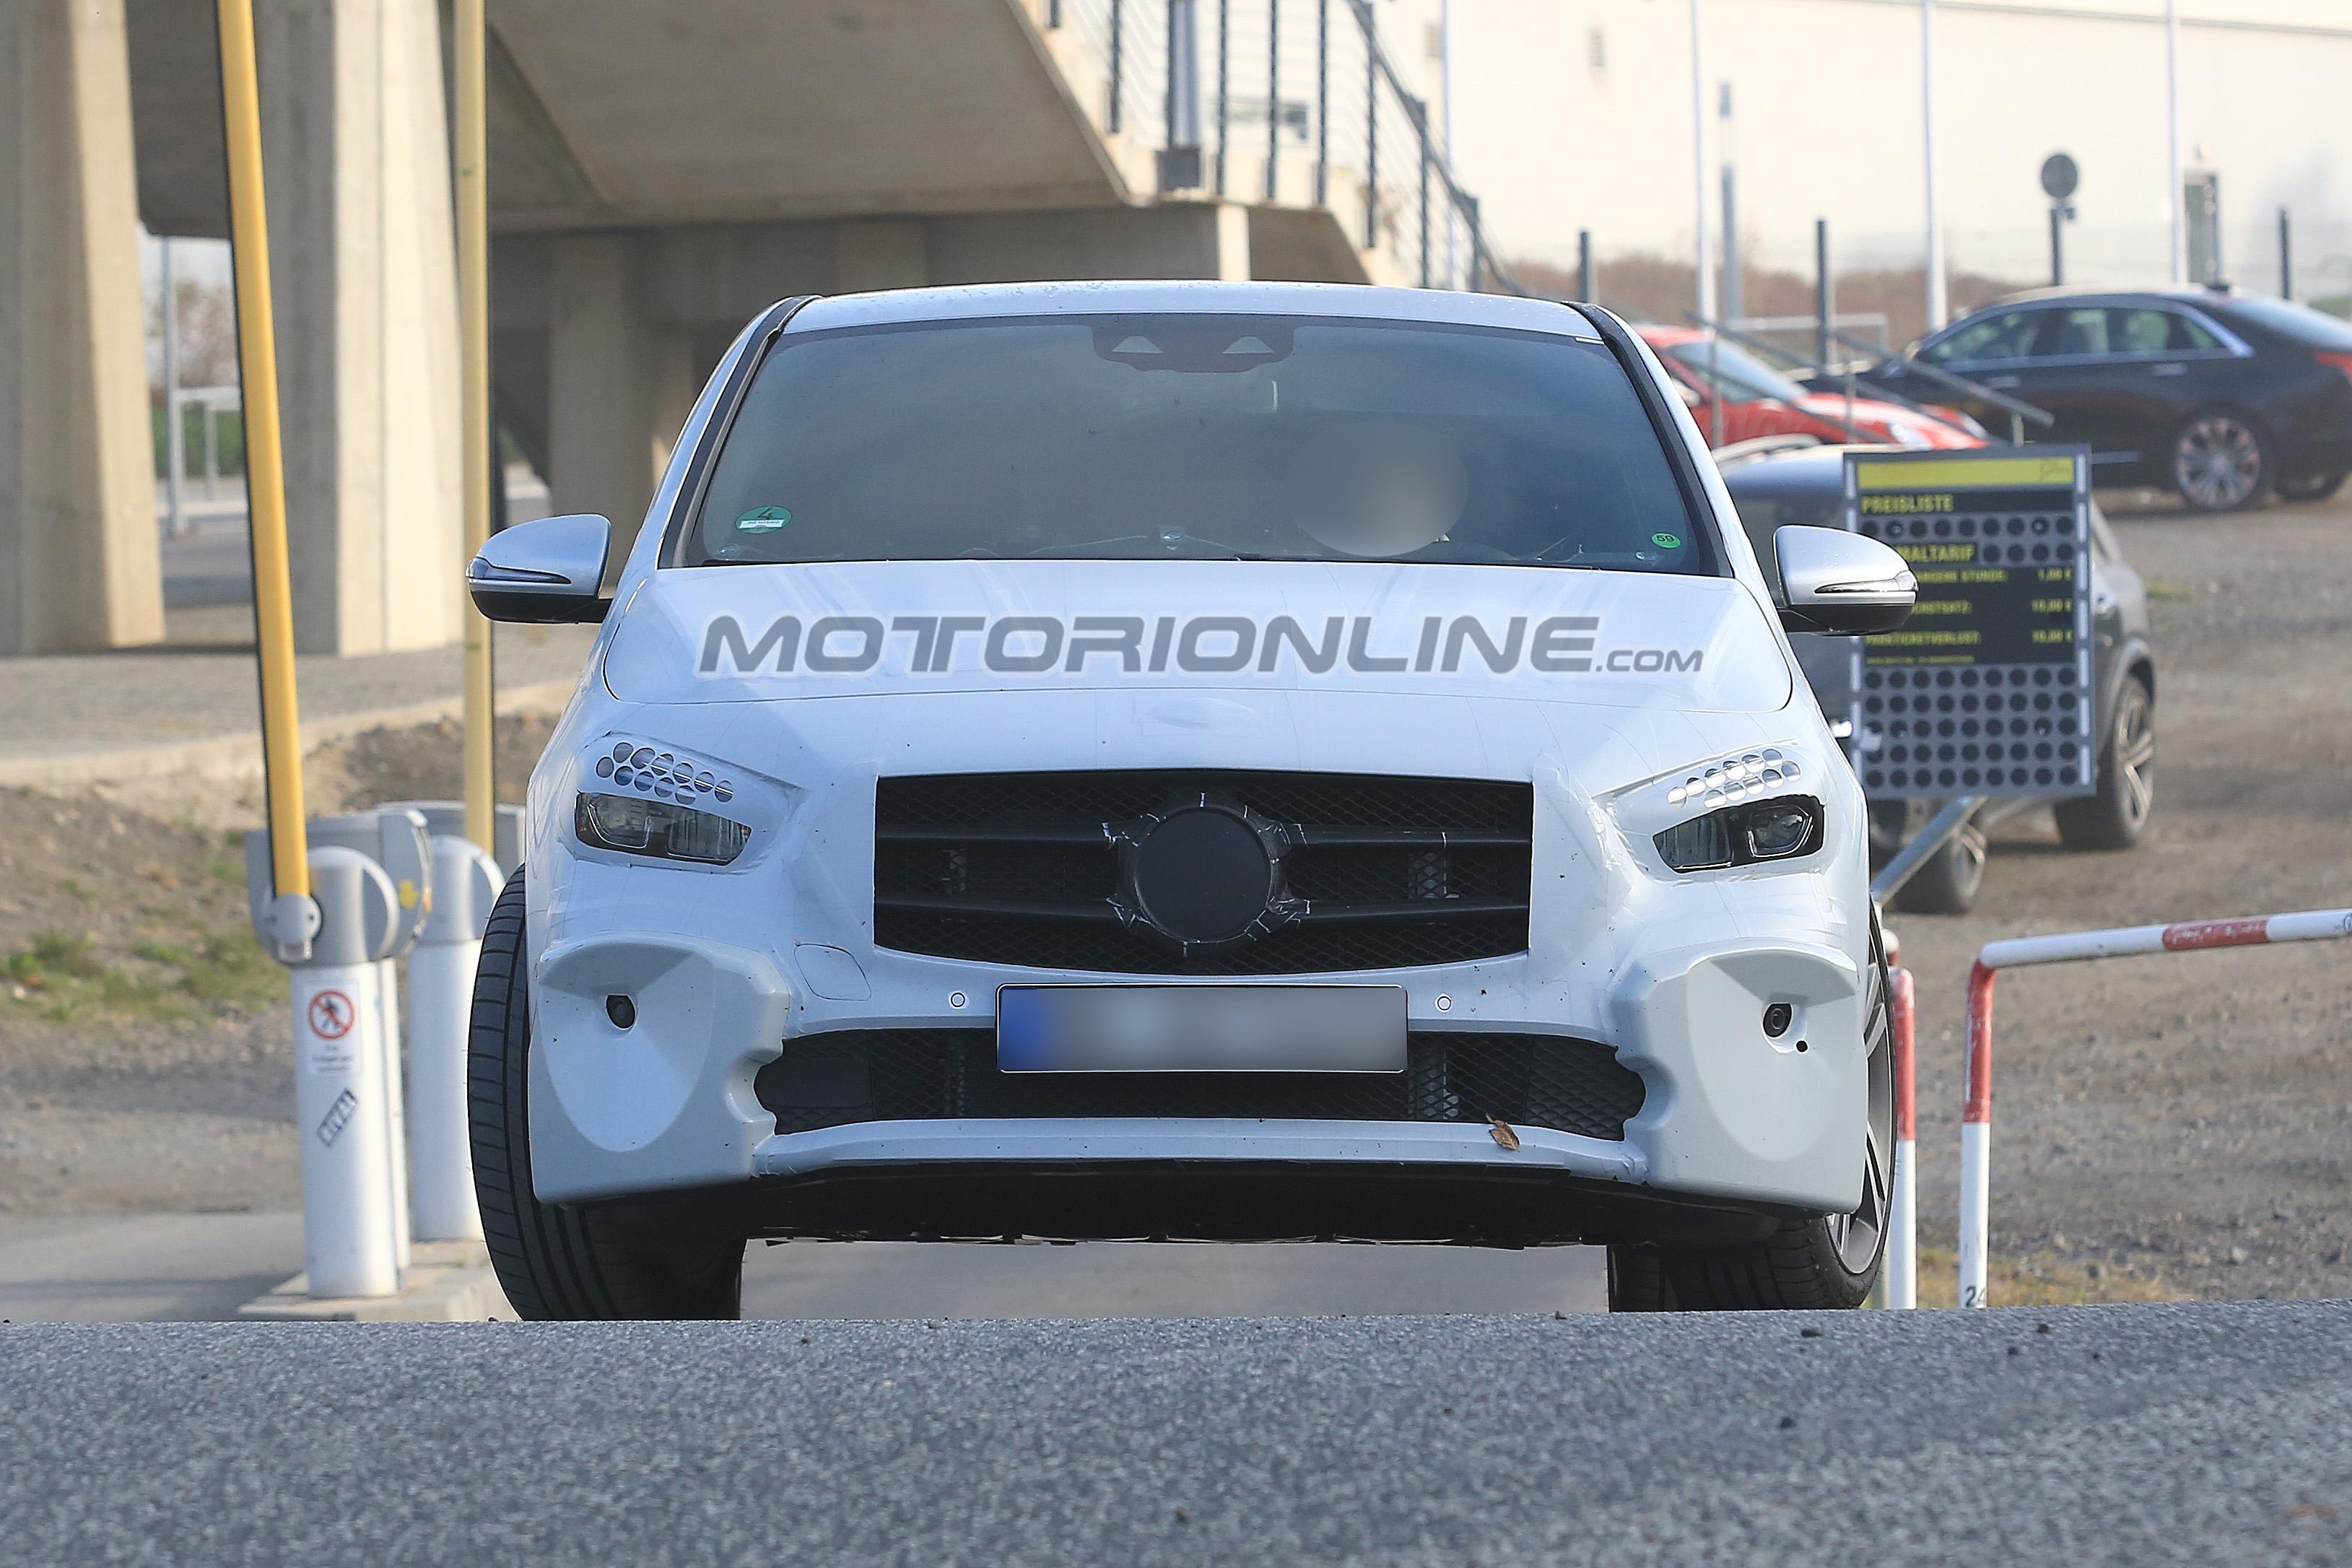 Mercedes Classe B foto spia 6 settembre 2018